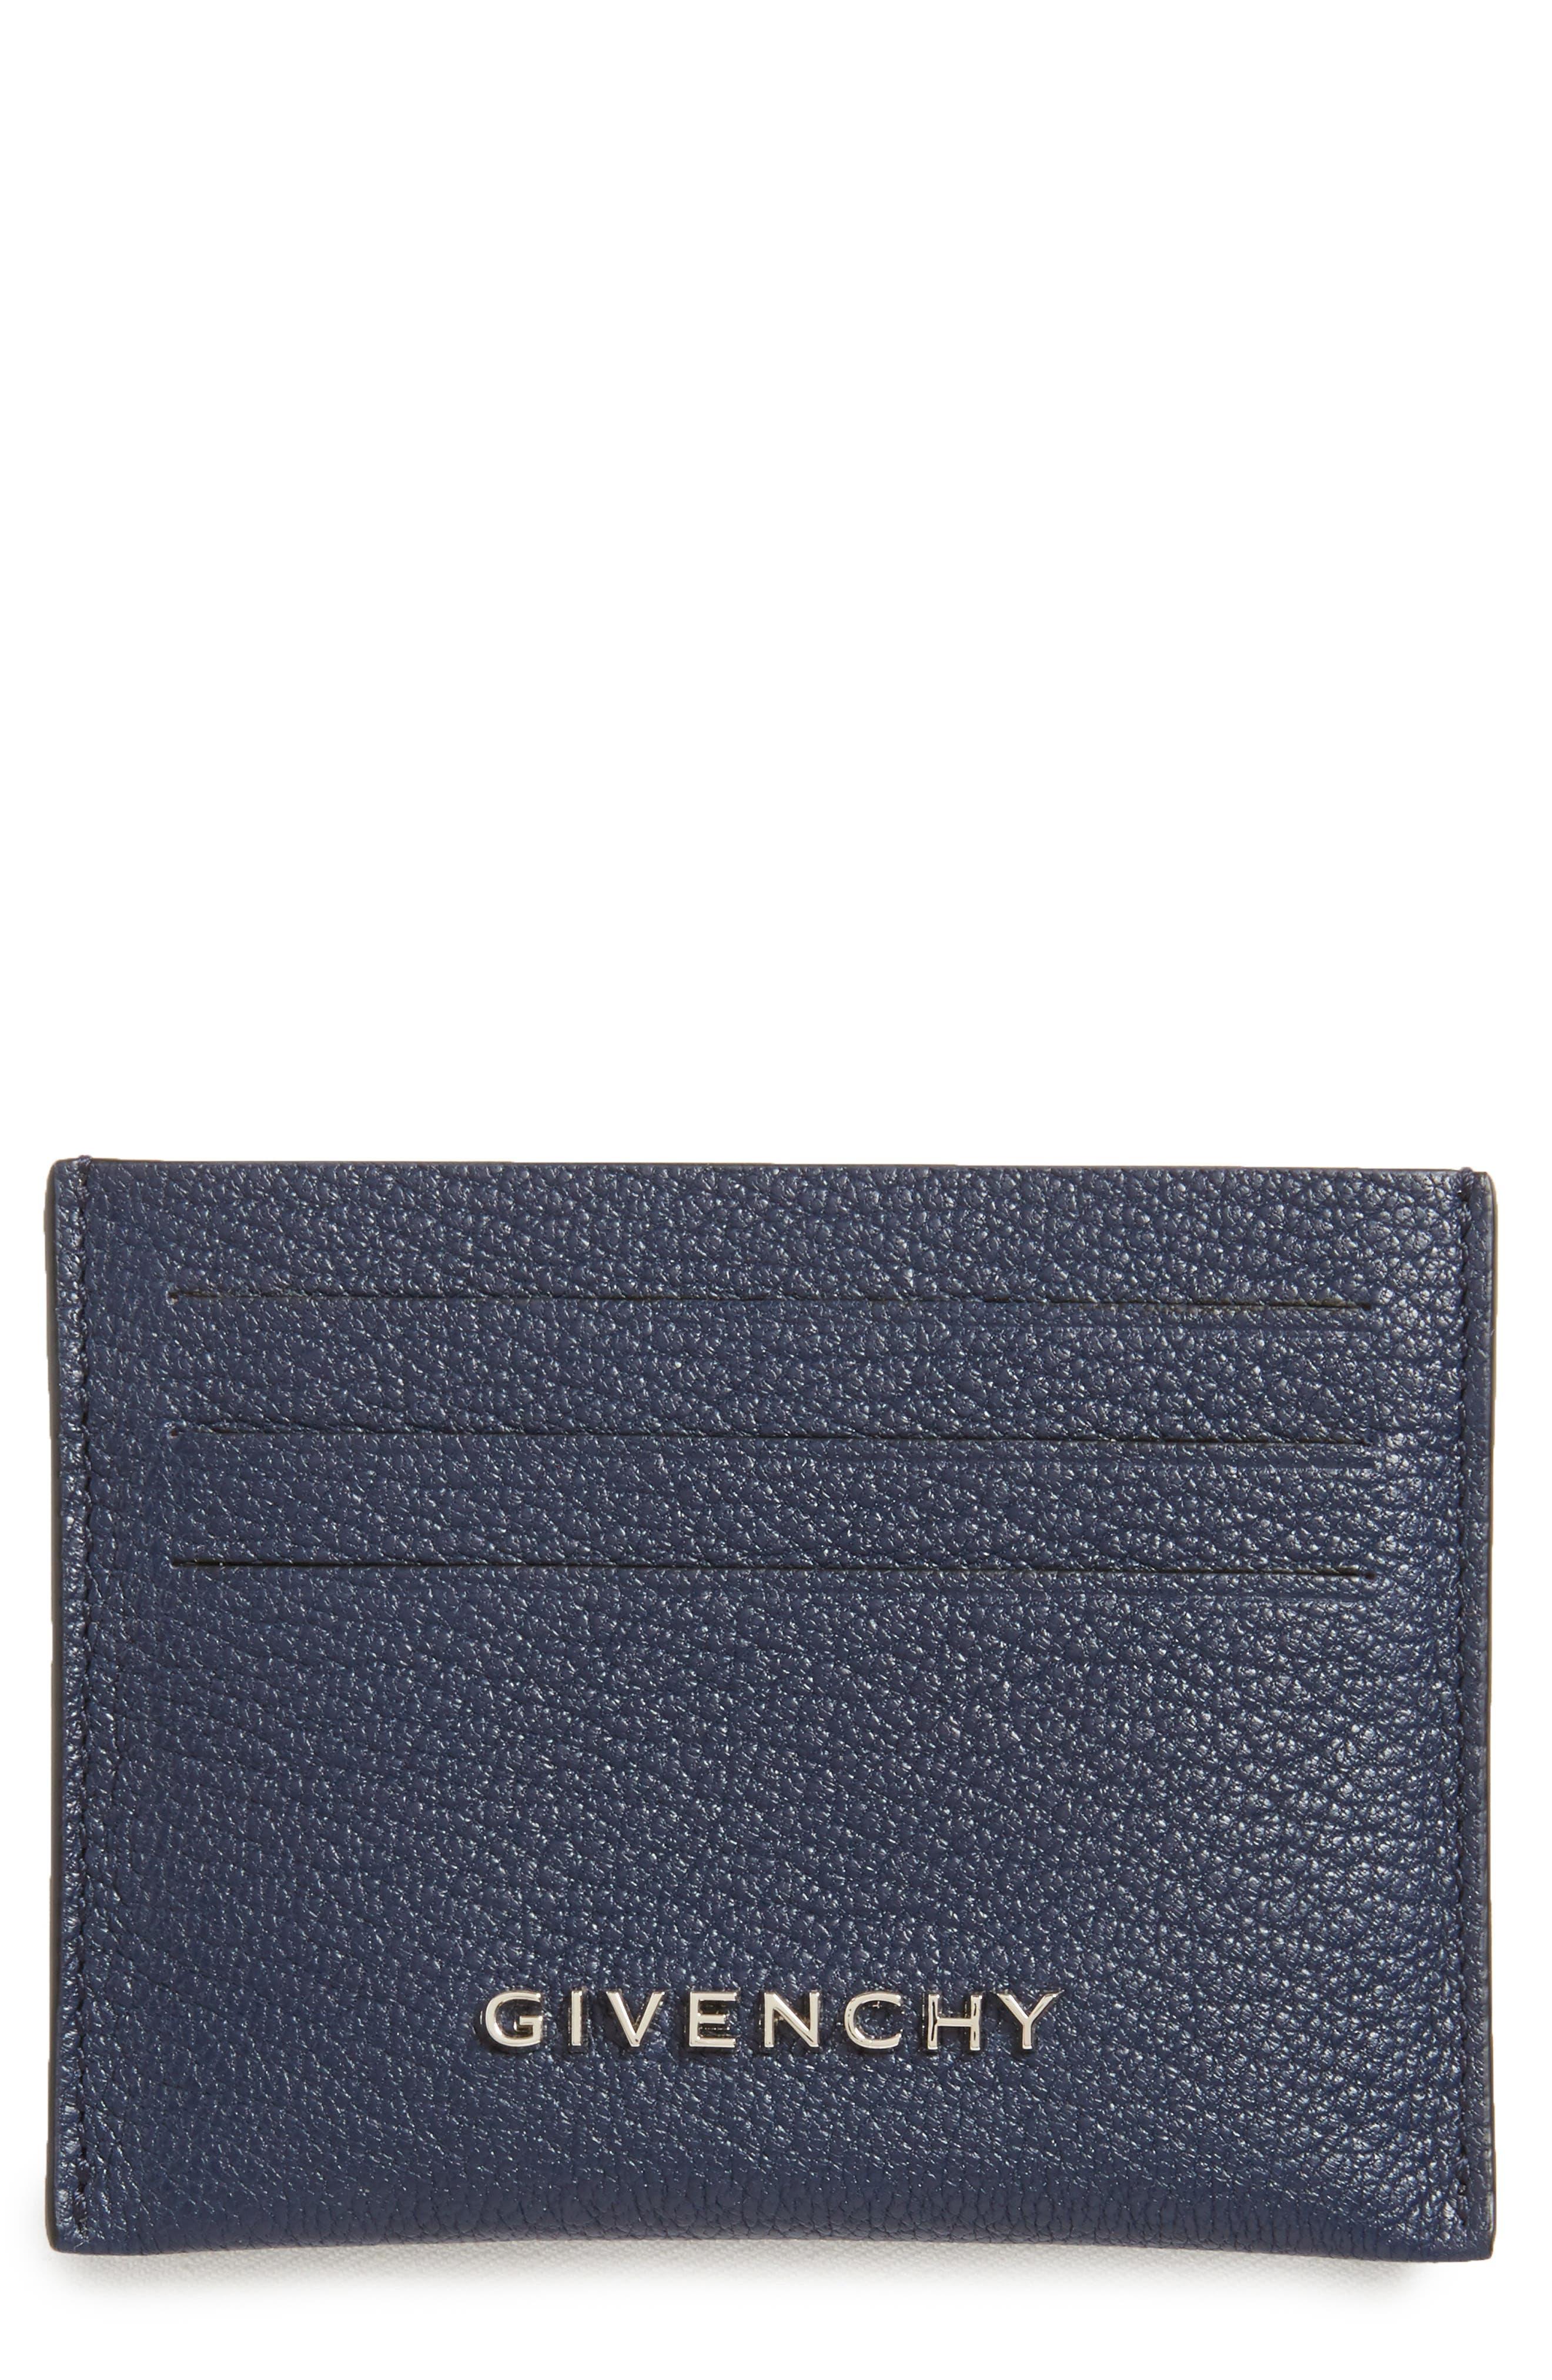 Main Image - Givenchy 'Pandora' Card Case